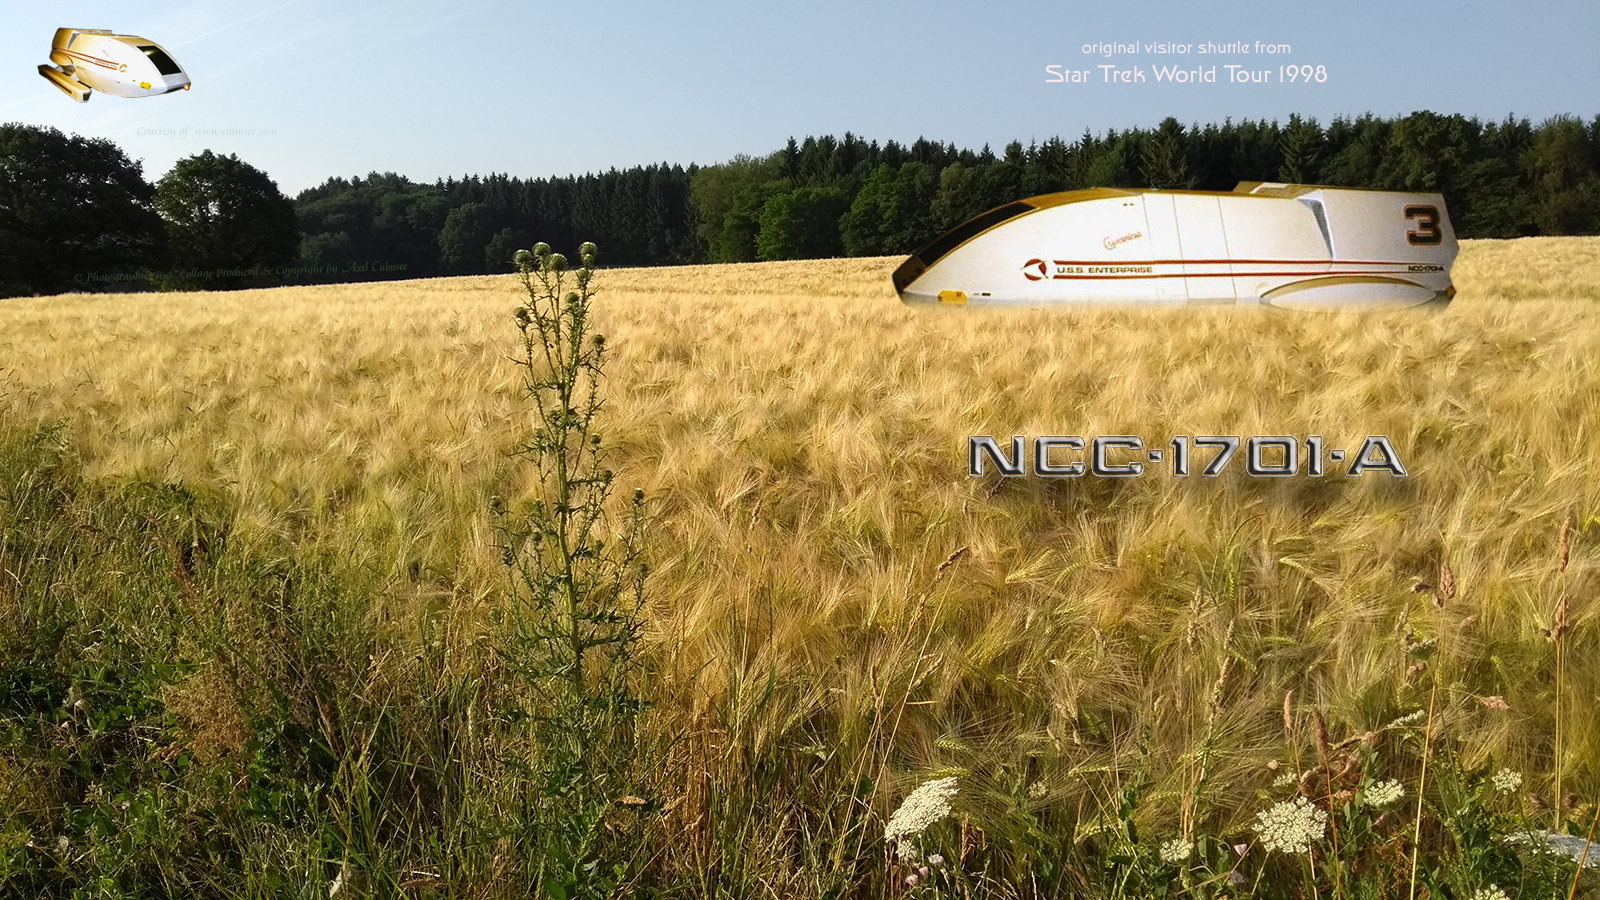 Copernicus - shuttle forced field landing timeline Star Trek World Tour Duesseldorf 1998